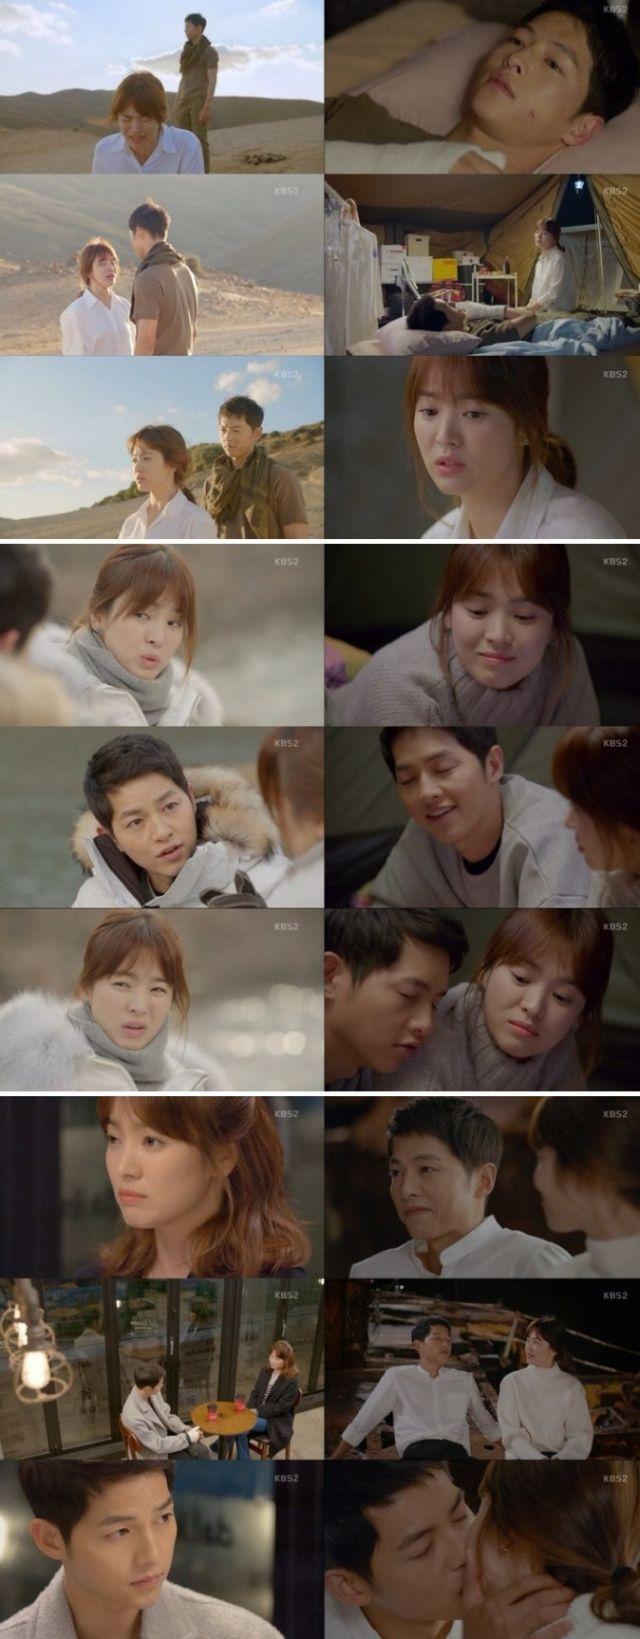 Added final episode 16 captures for the Korean drama 'Descendants of the Sun'.